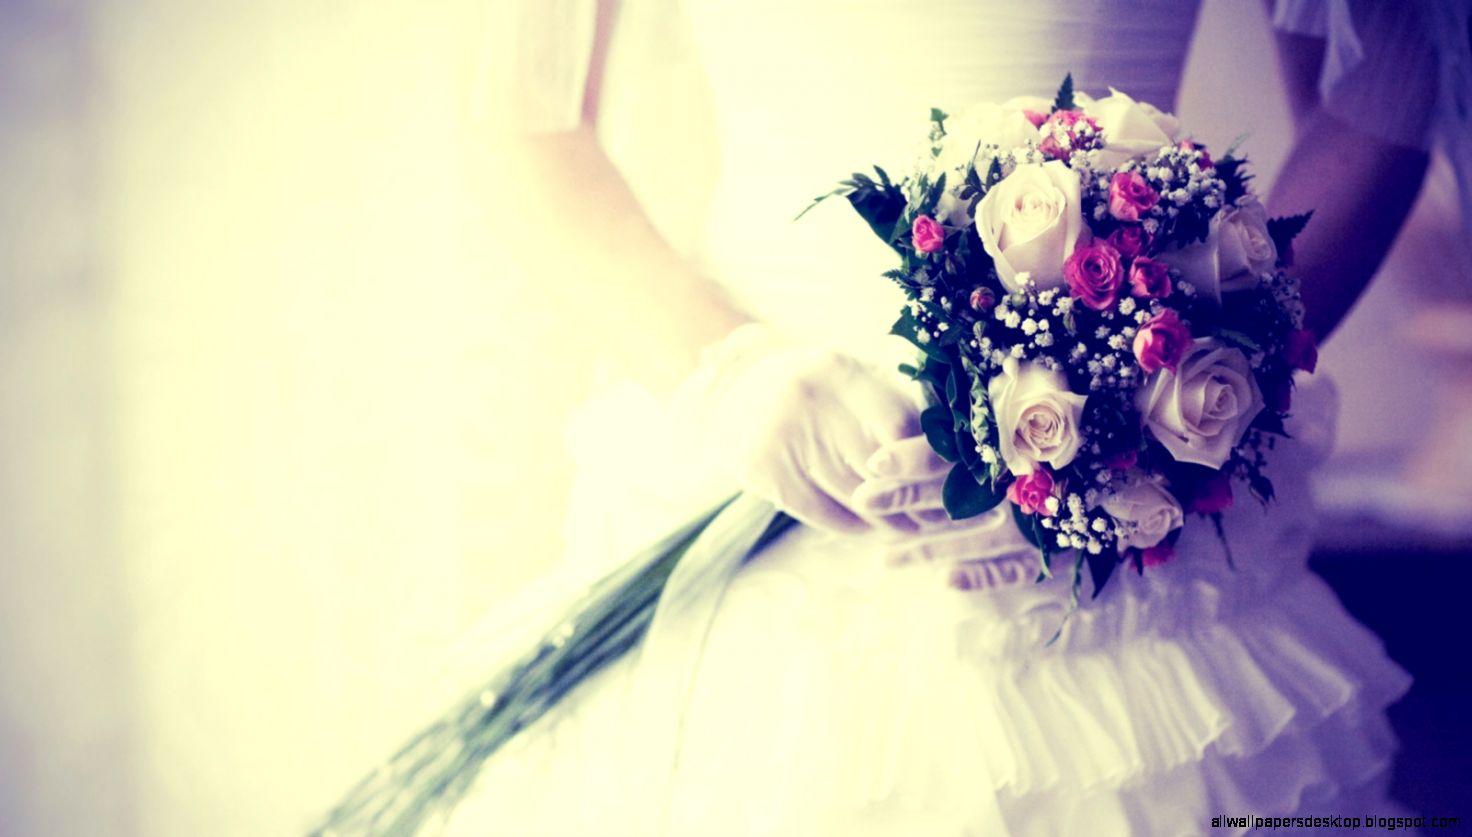 Download Wallpaper 1600x900 Bride Bouquet Flowers Gloves